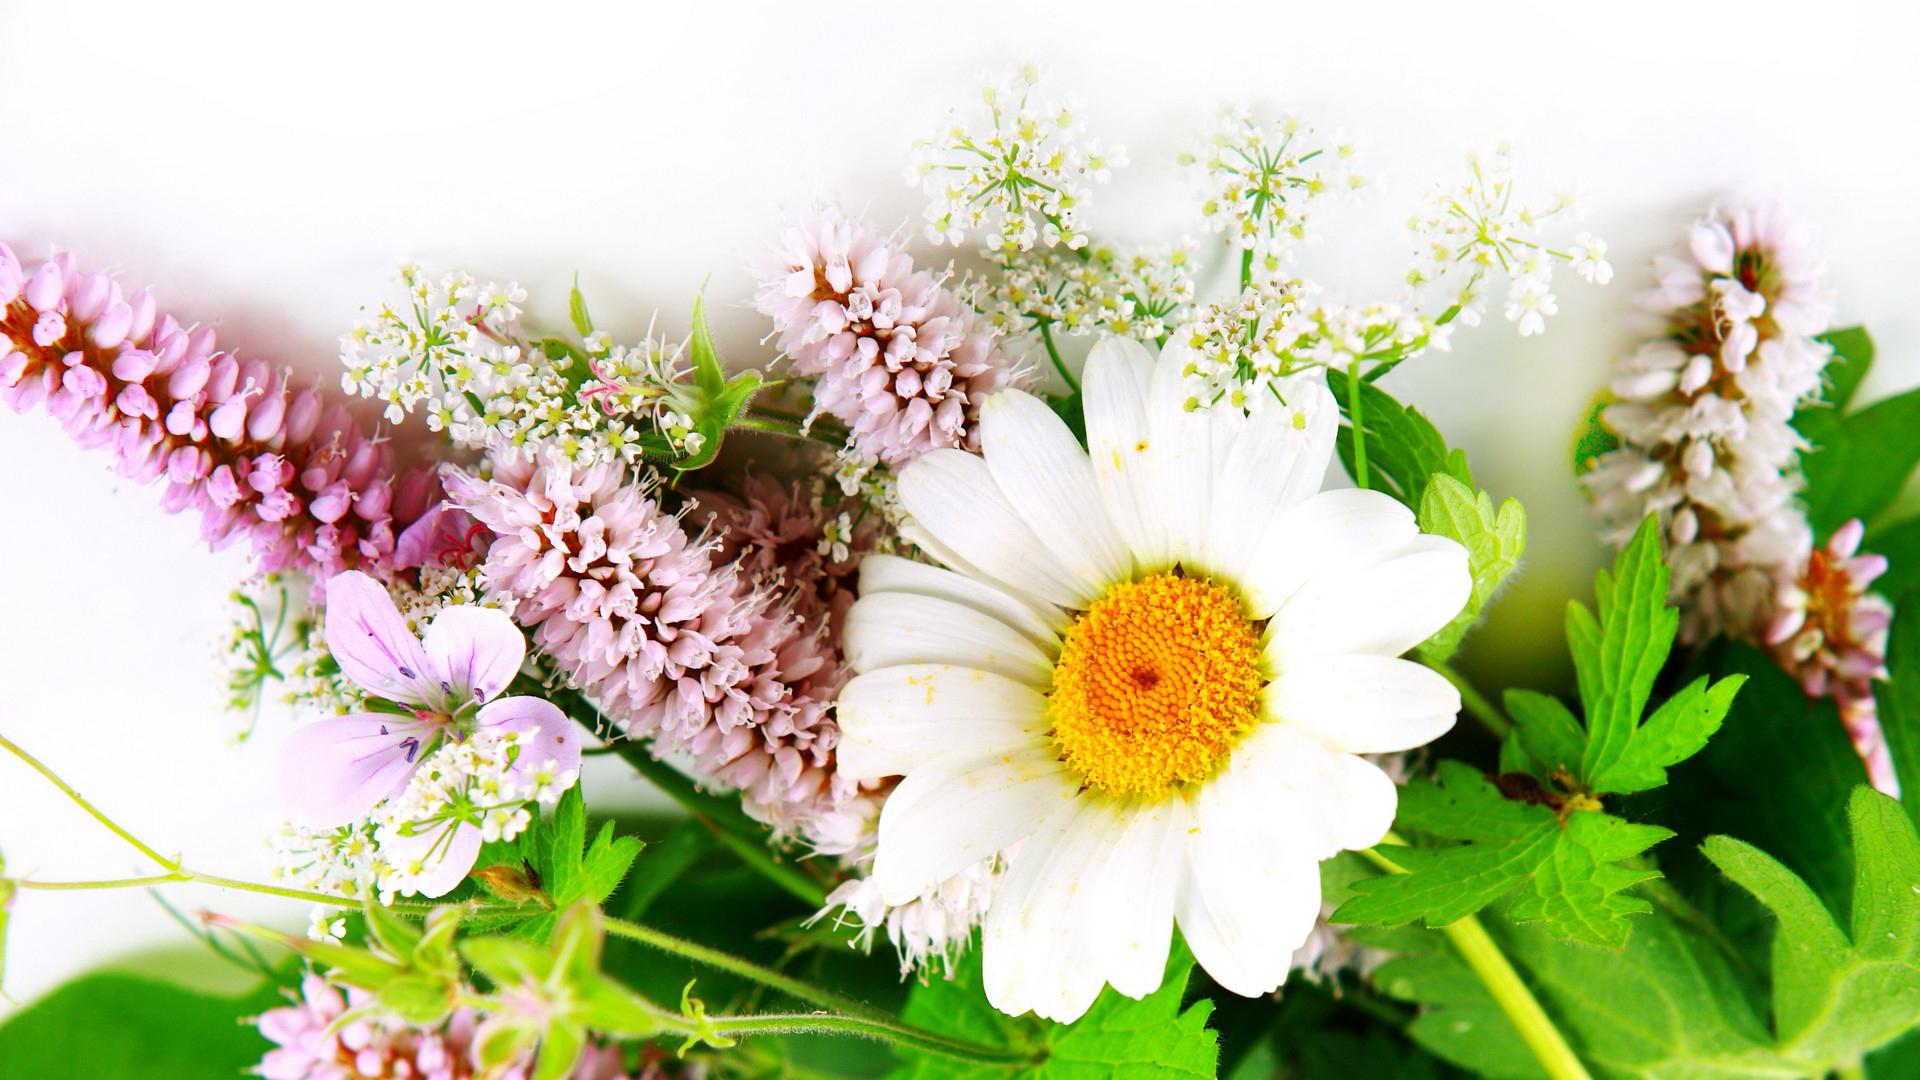 Free Flower Wallpaper Downloads Wallpapersafari